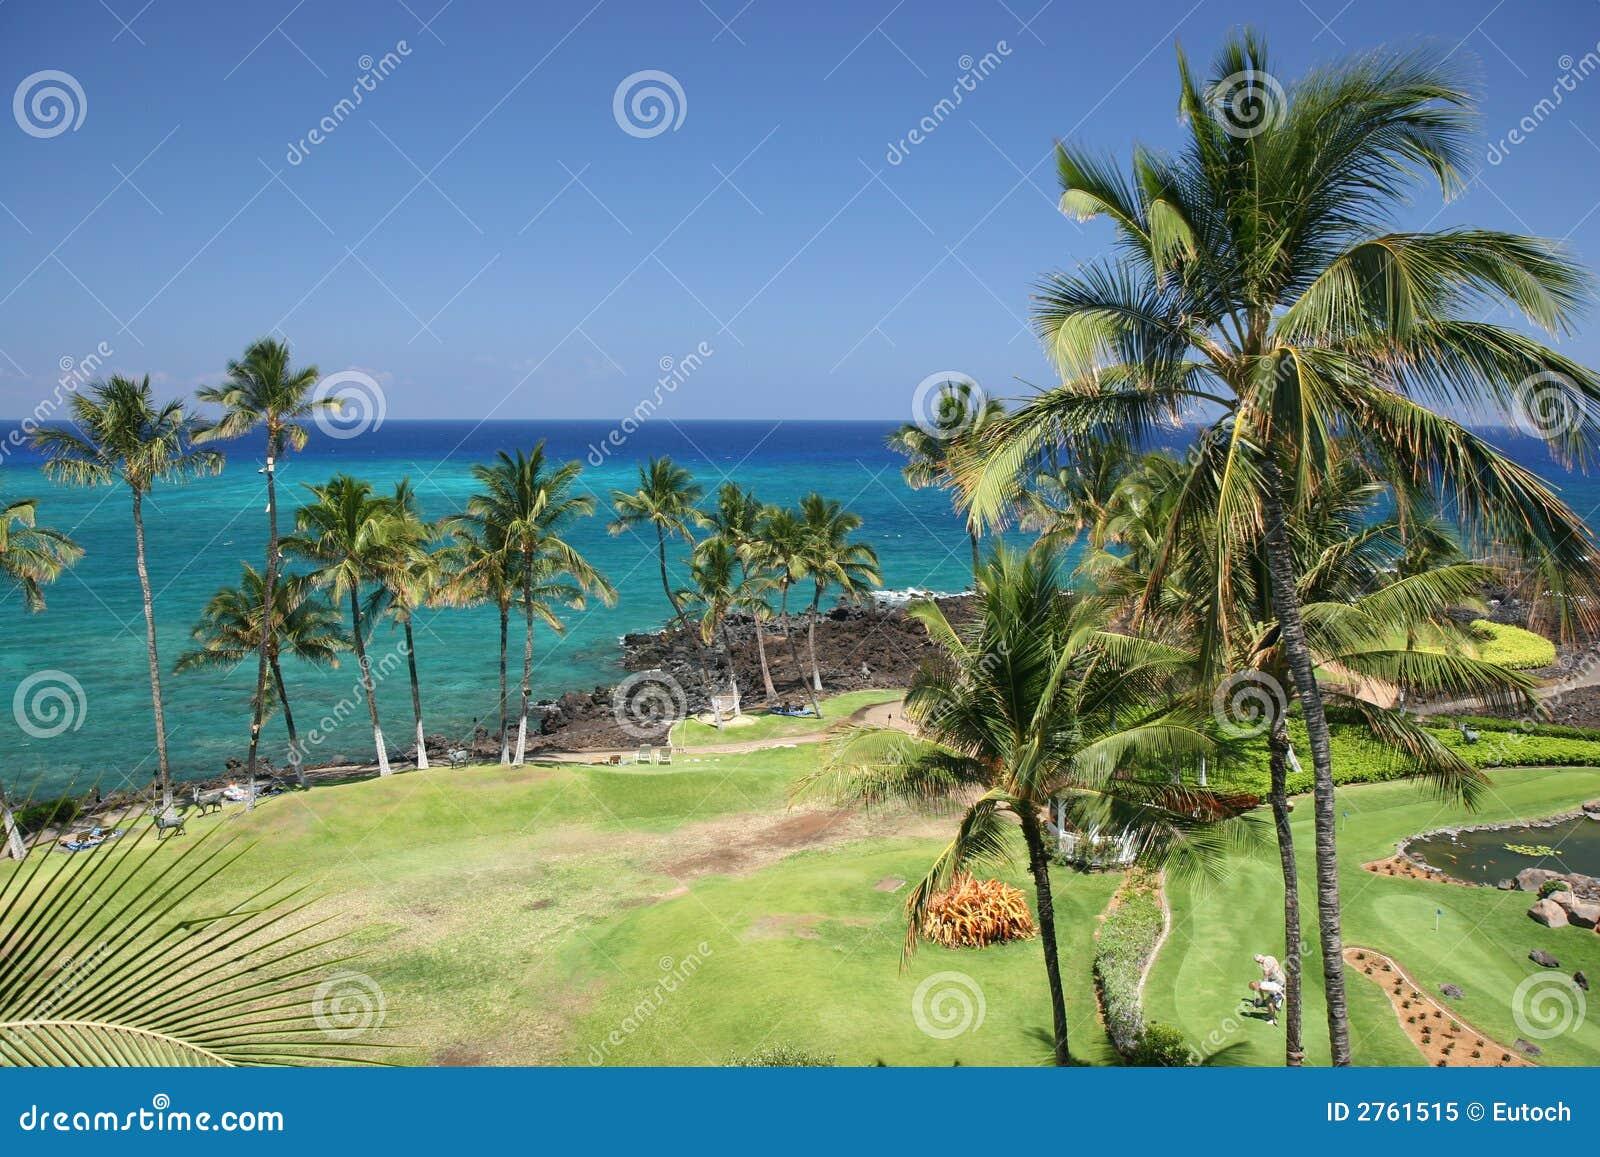 stock image of hawaiian - photo #11